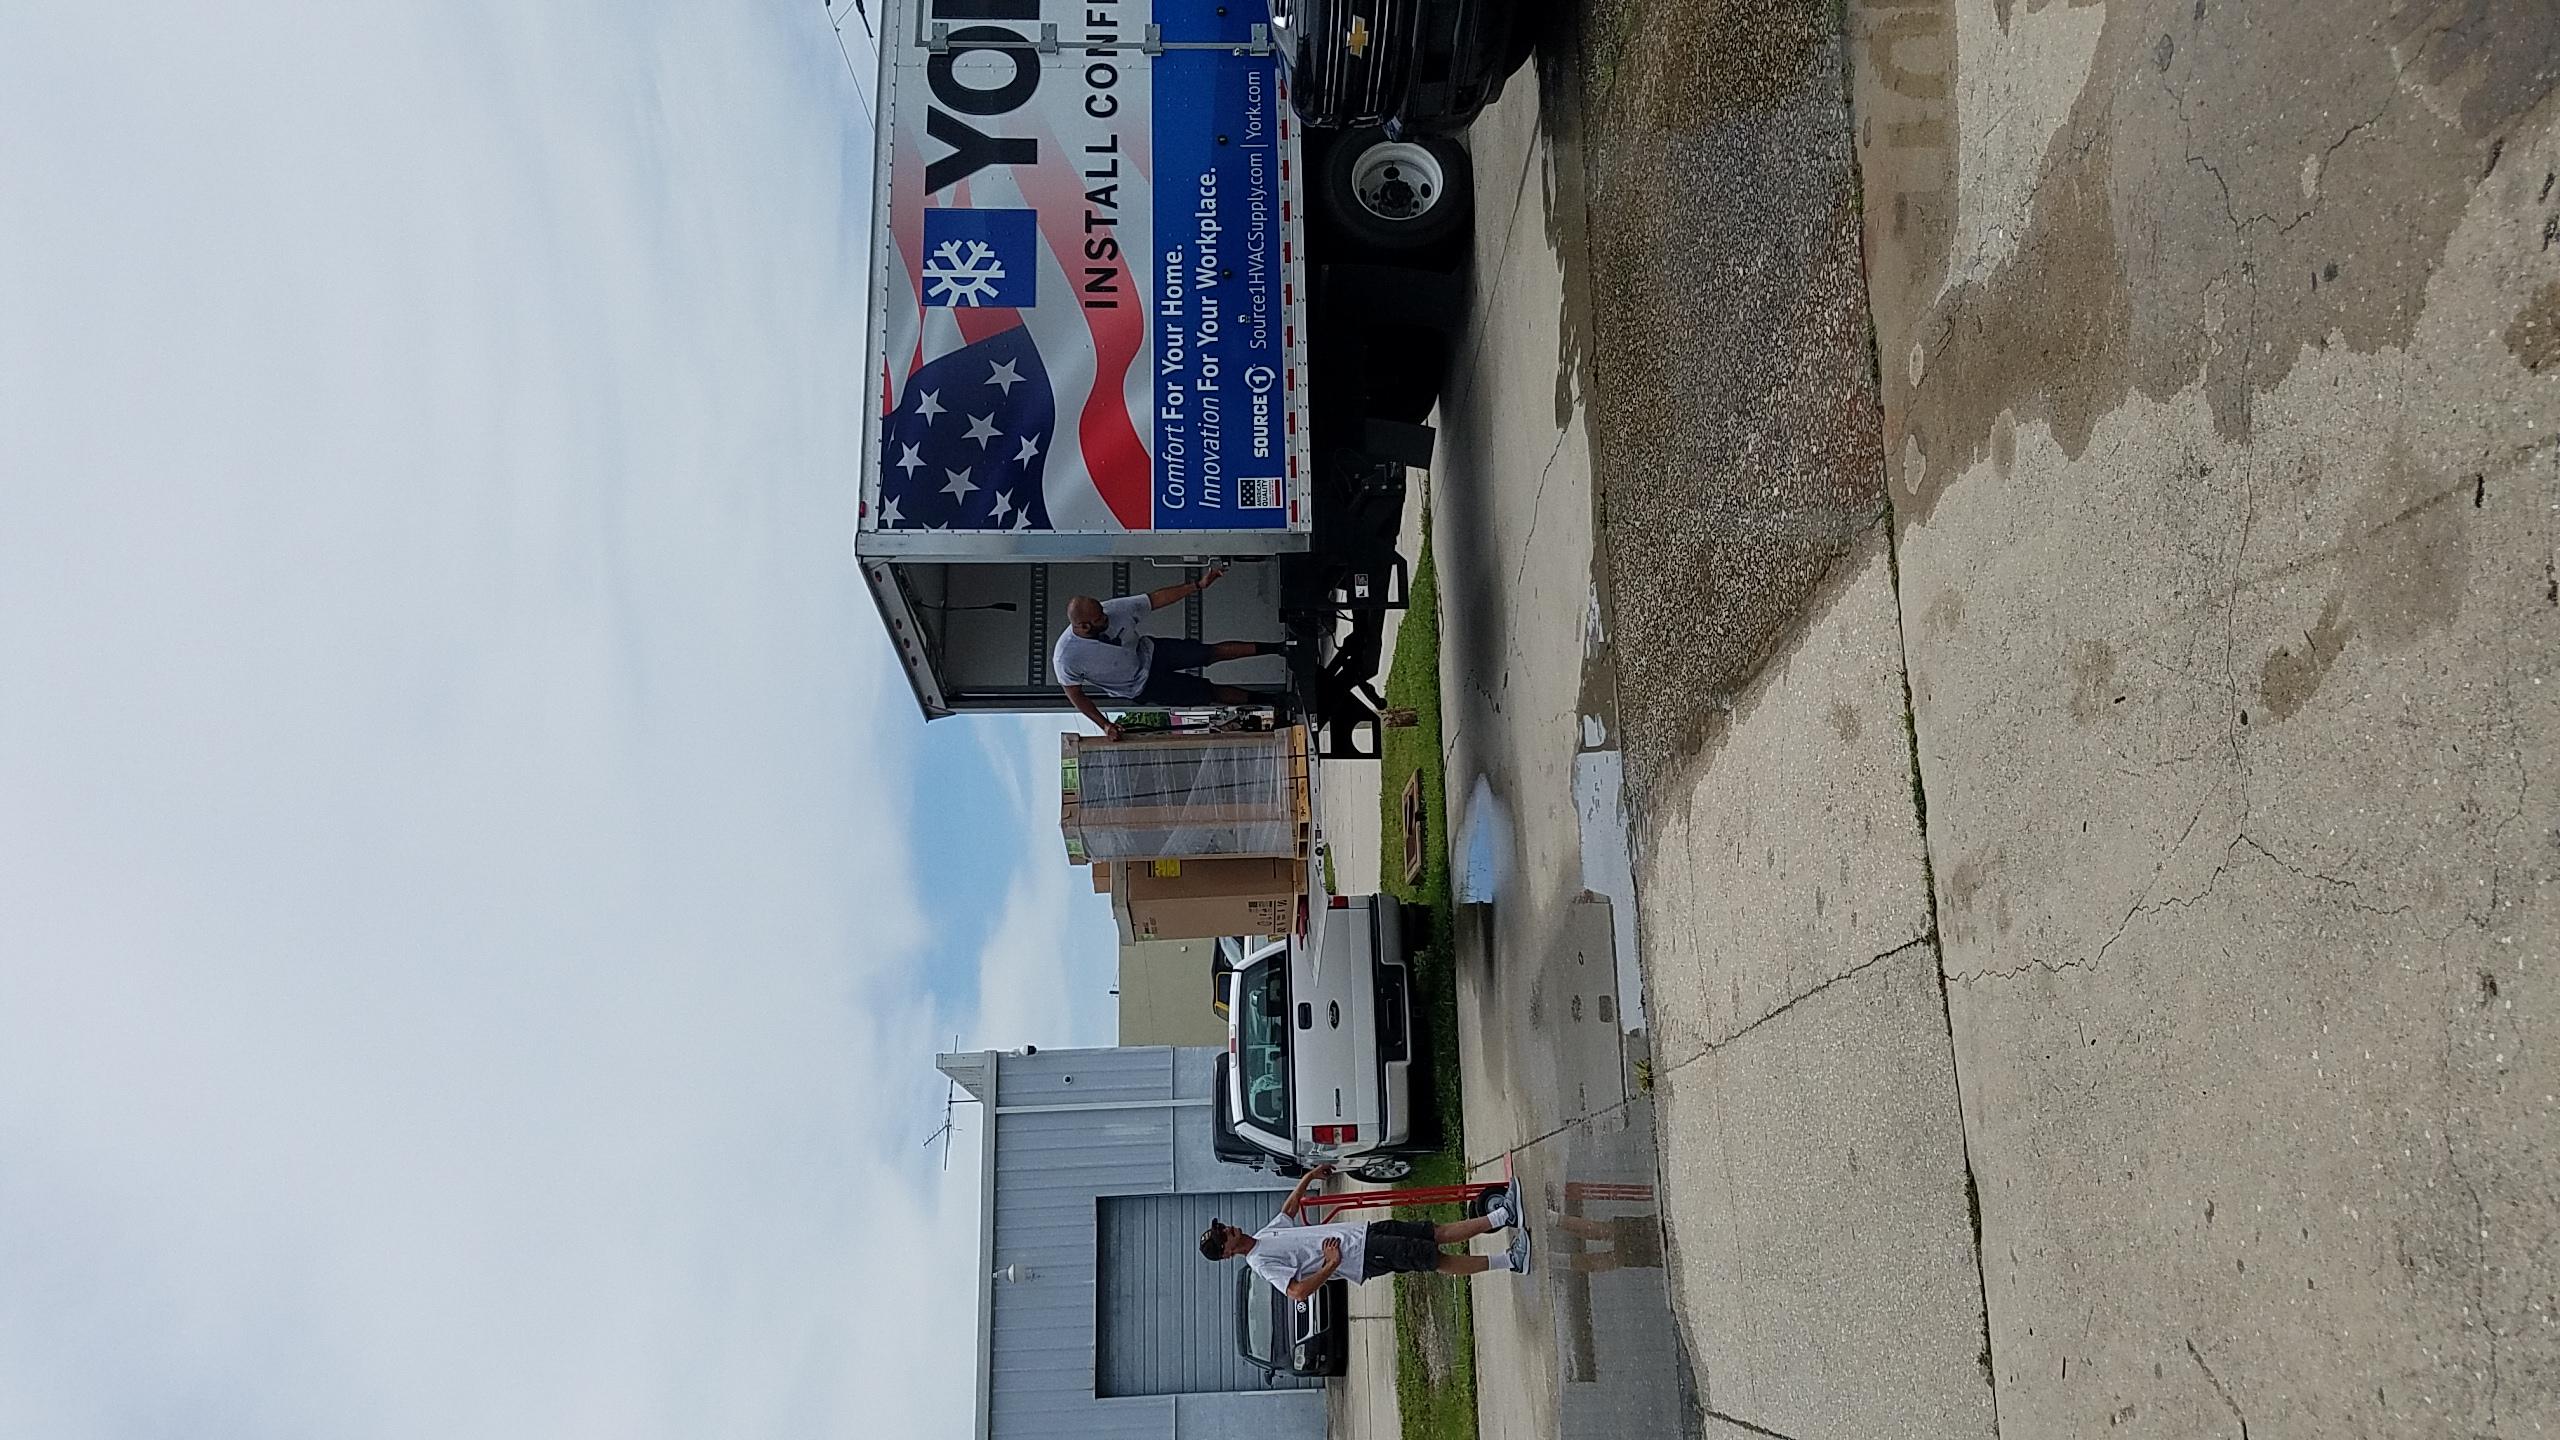 York Authorized Dealer Venice, FL Sarasota County